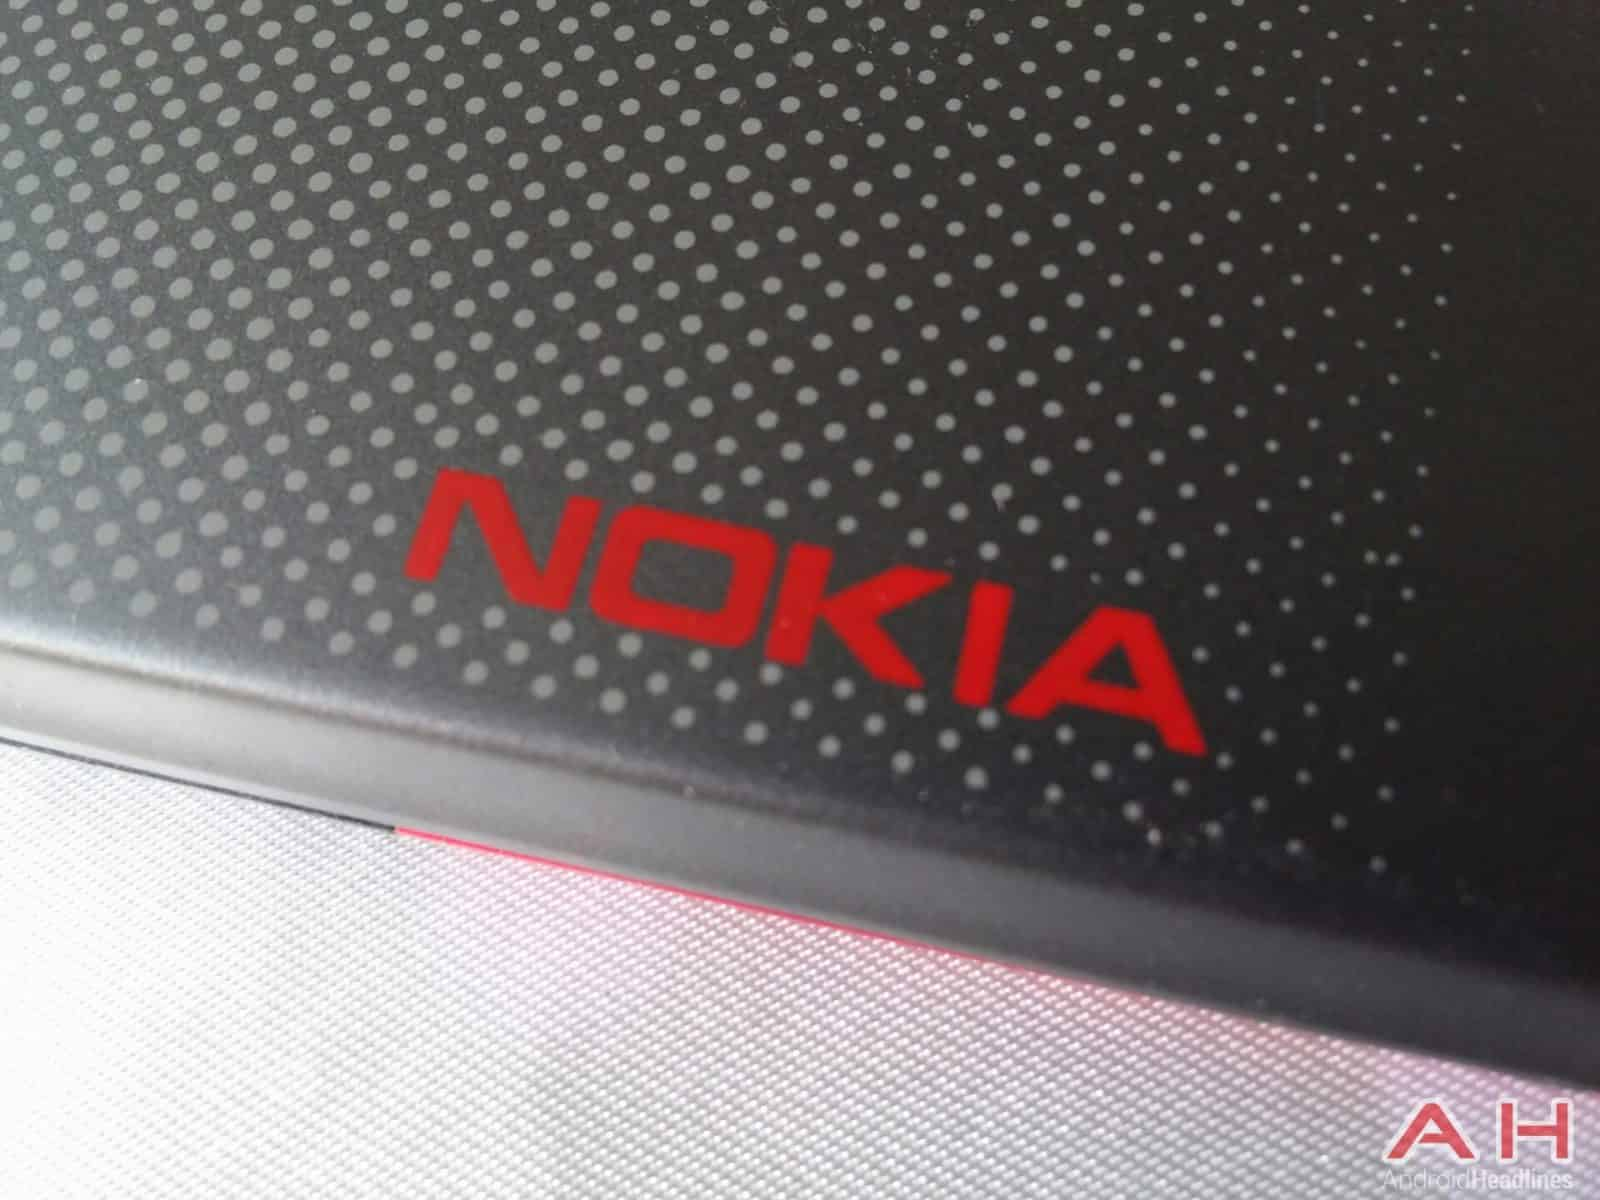 AH Nokia logo_34